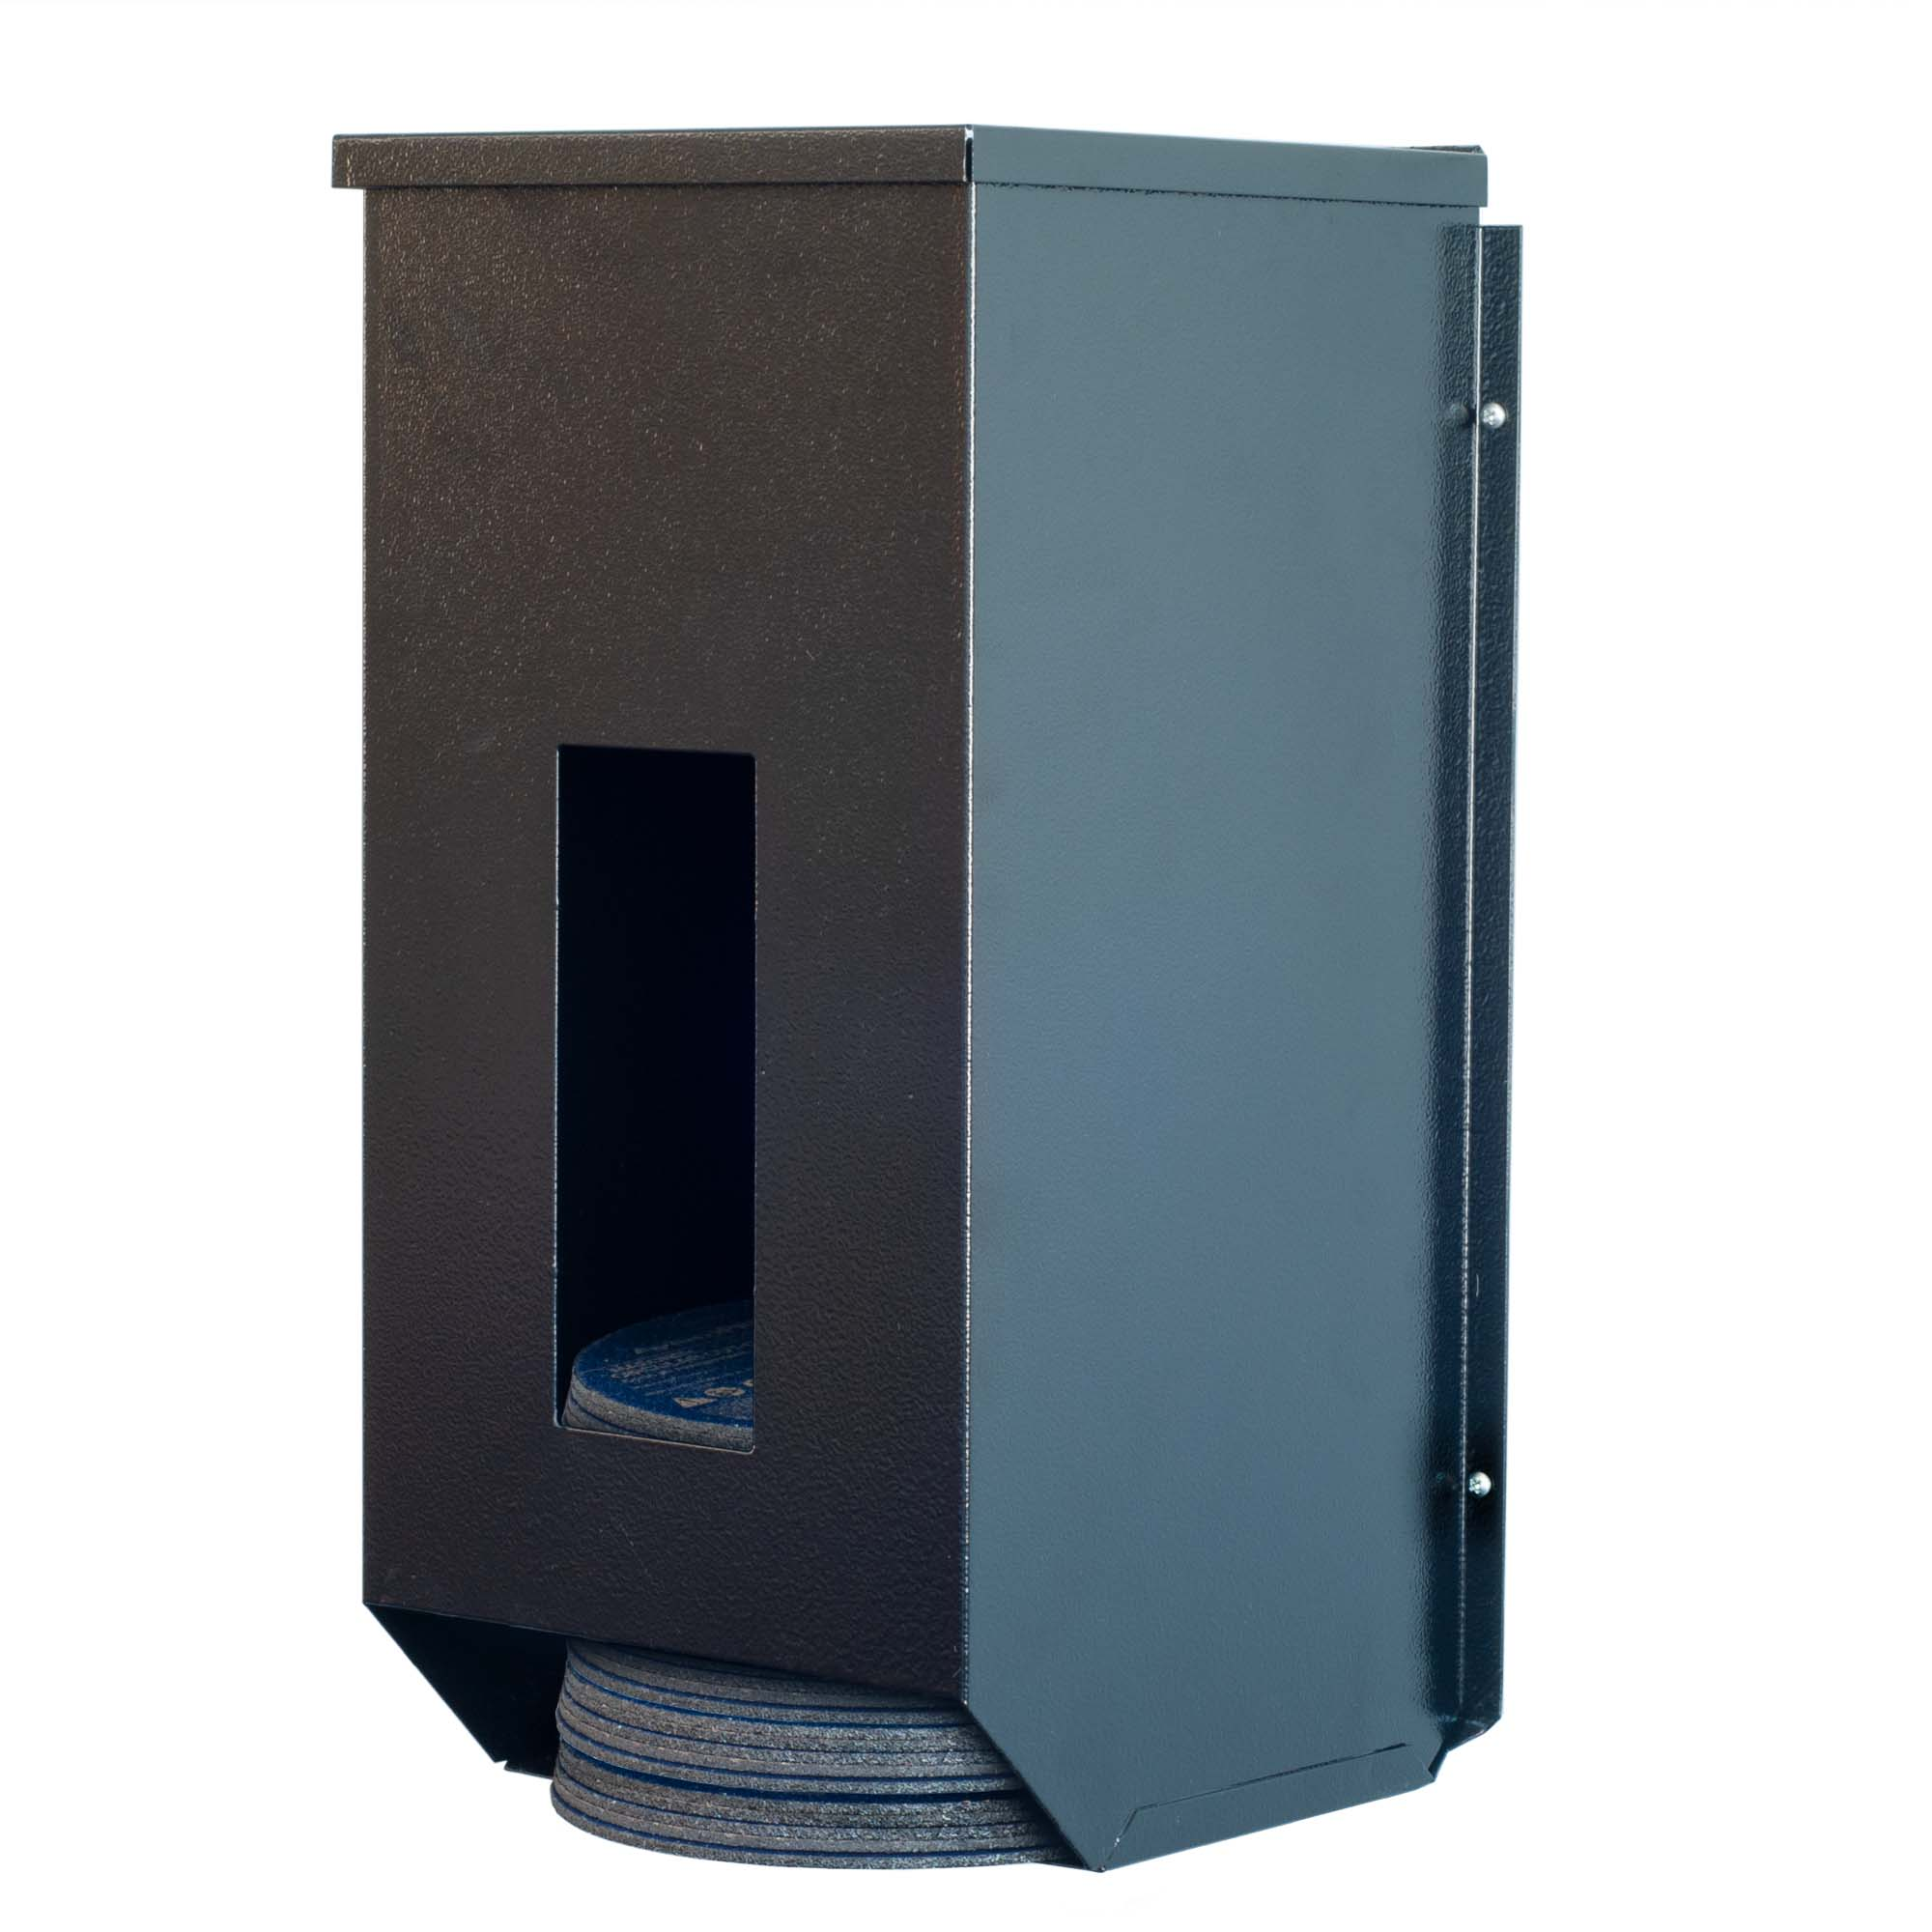 Craftline Storage System | Made In USA | PL-7DISC | 7 Inch Grinder wheel dispenser